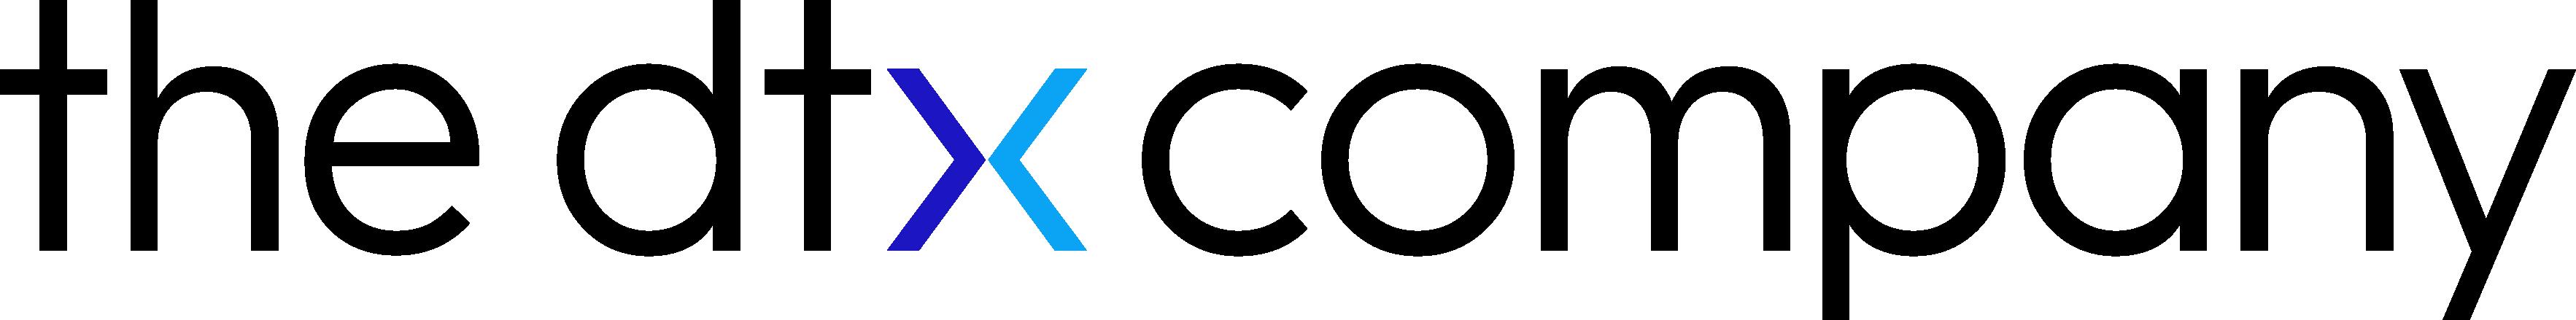 DTX Company logo, Get Us PPE partner